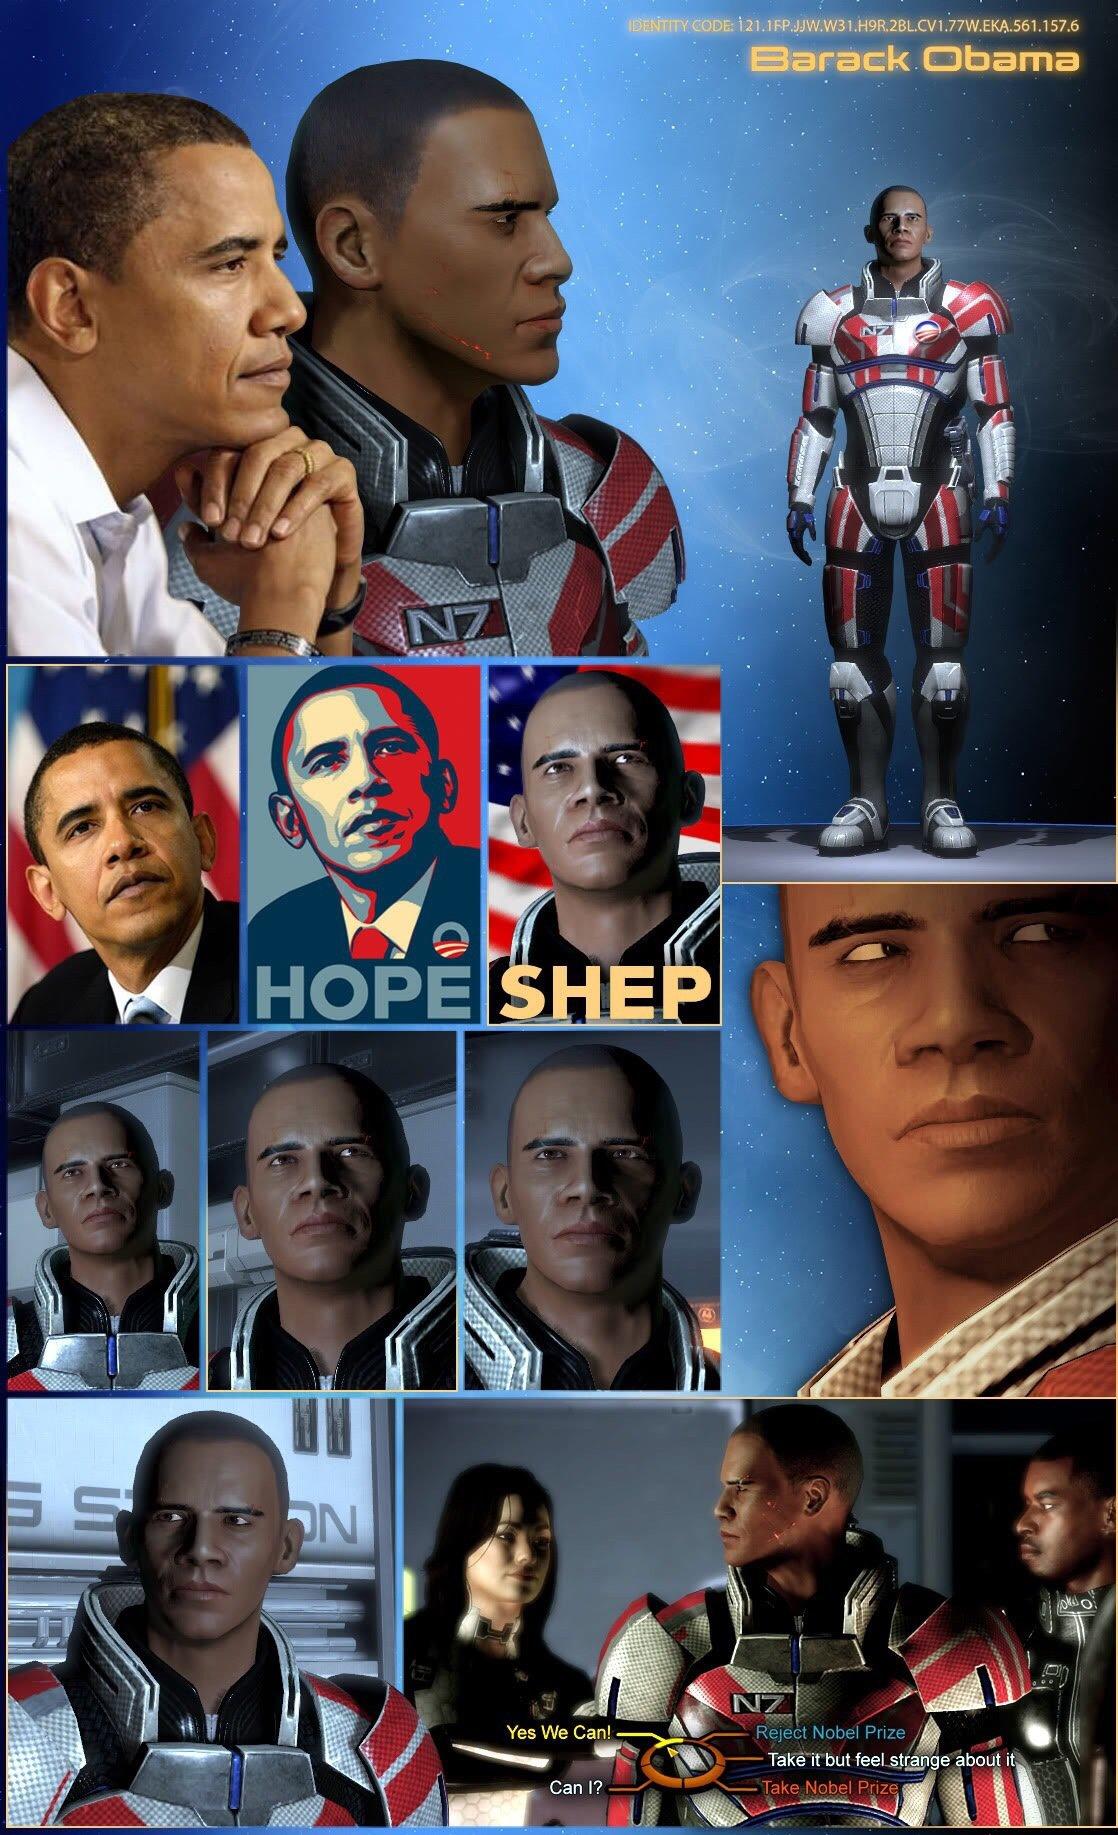 Obama shepard omg - Изображение 1